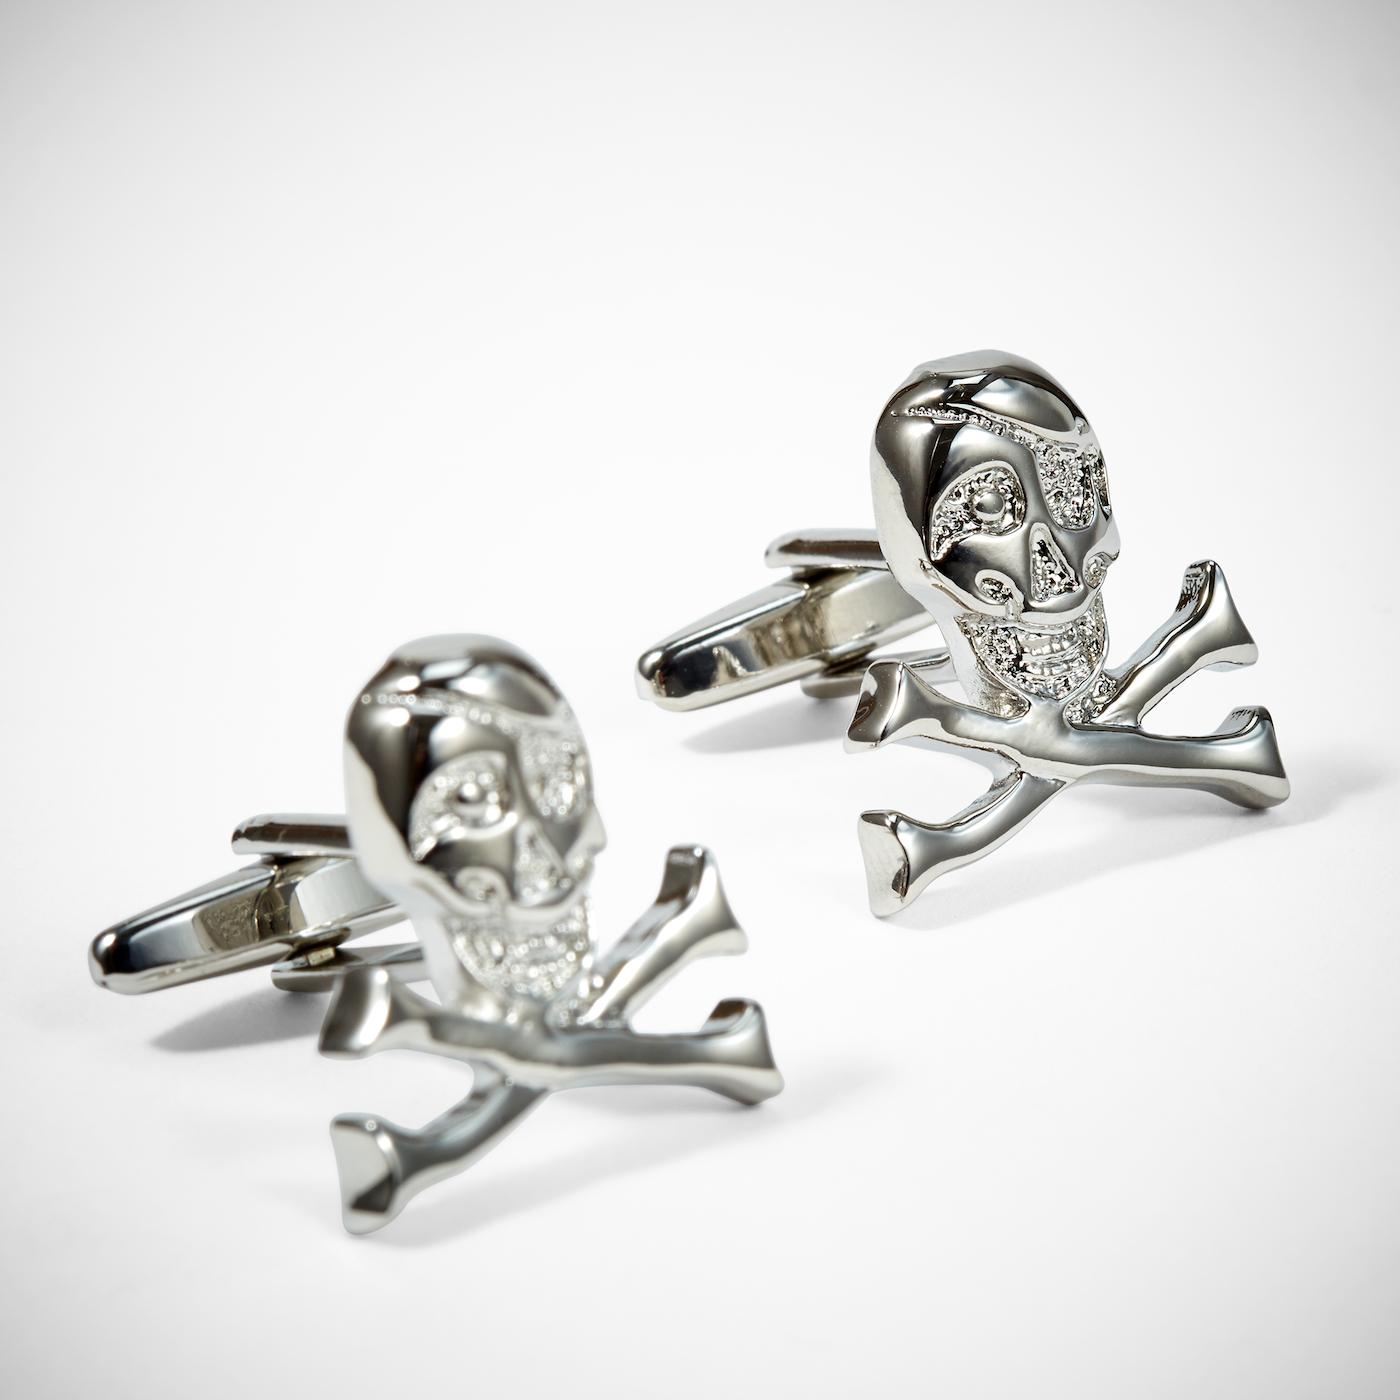 Skull and Crossbones Cuff-links: Silver